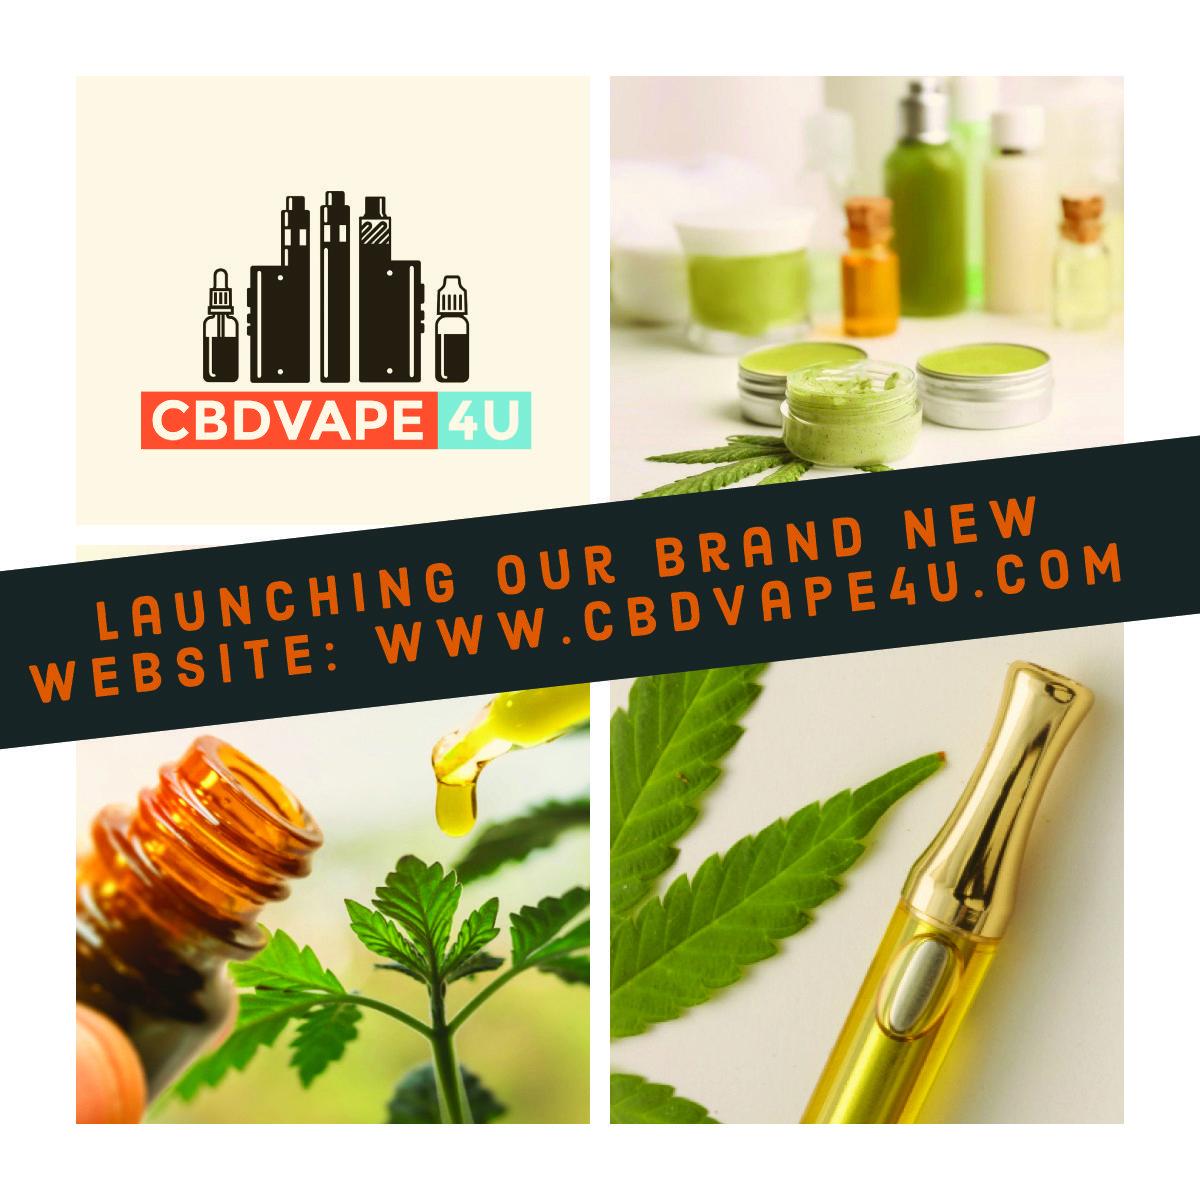 New Website Lauch Hemp, Product launch